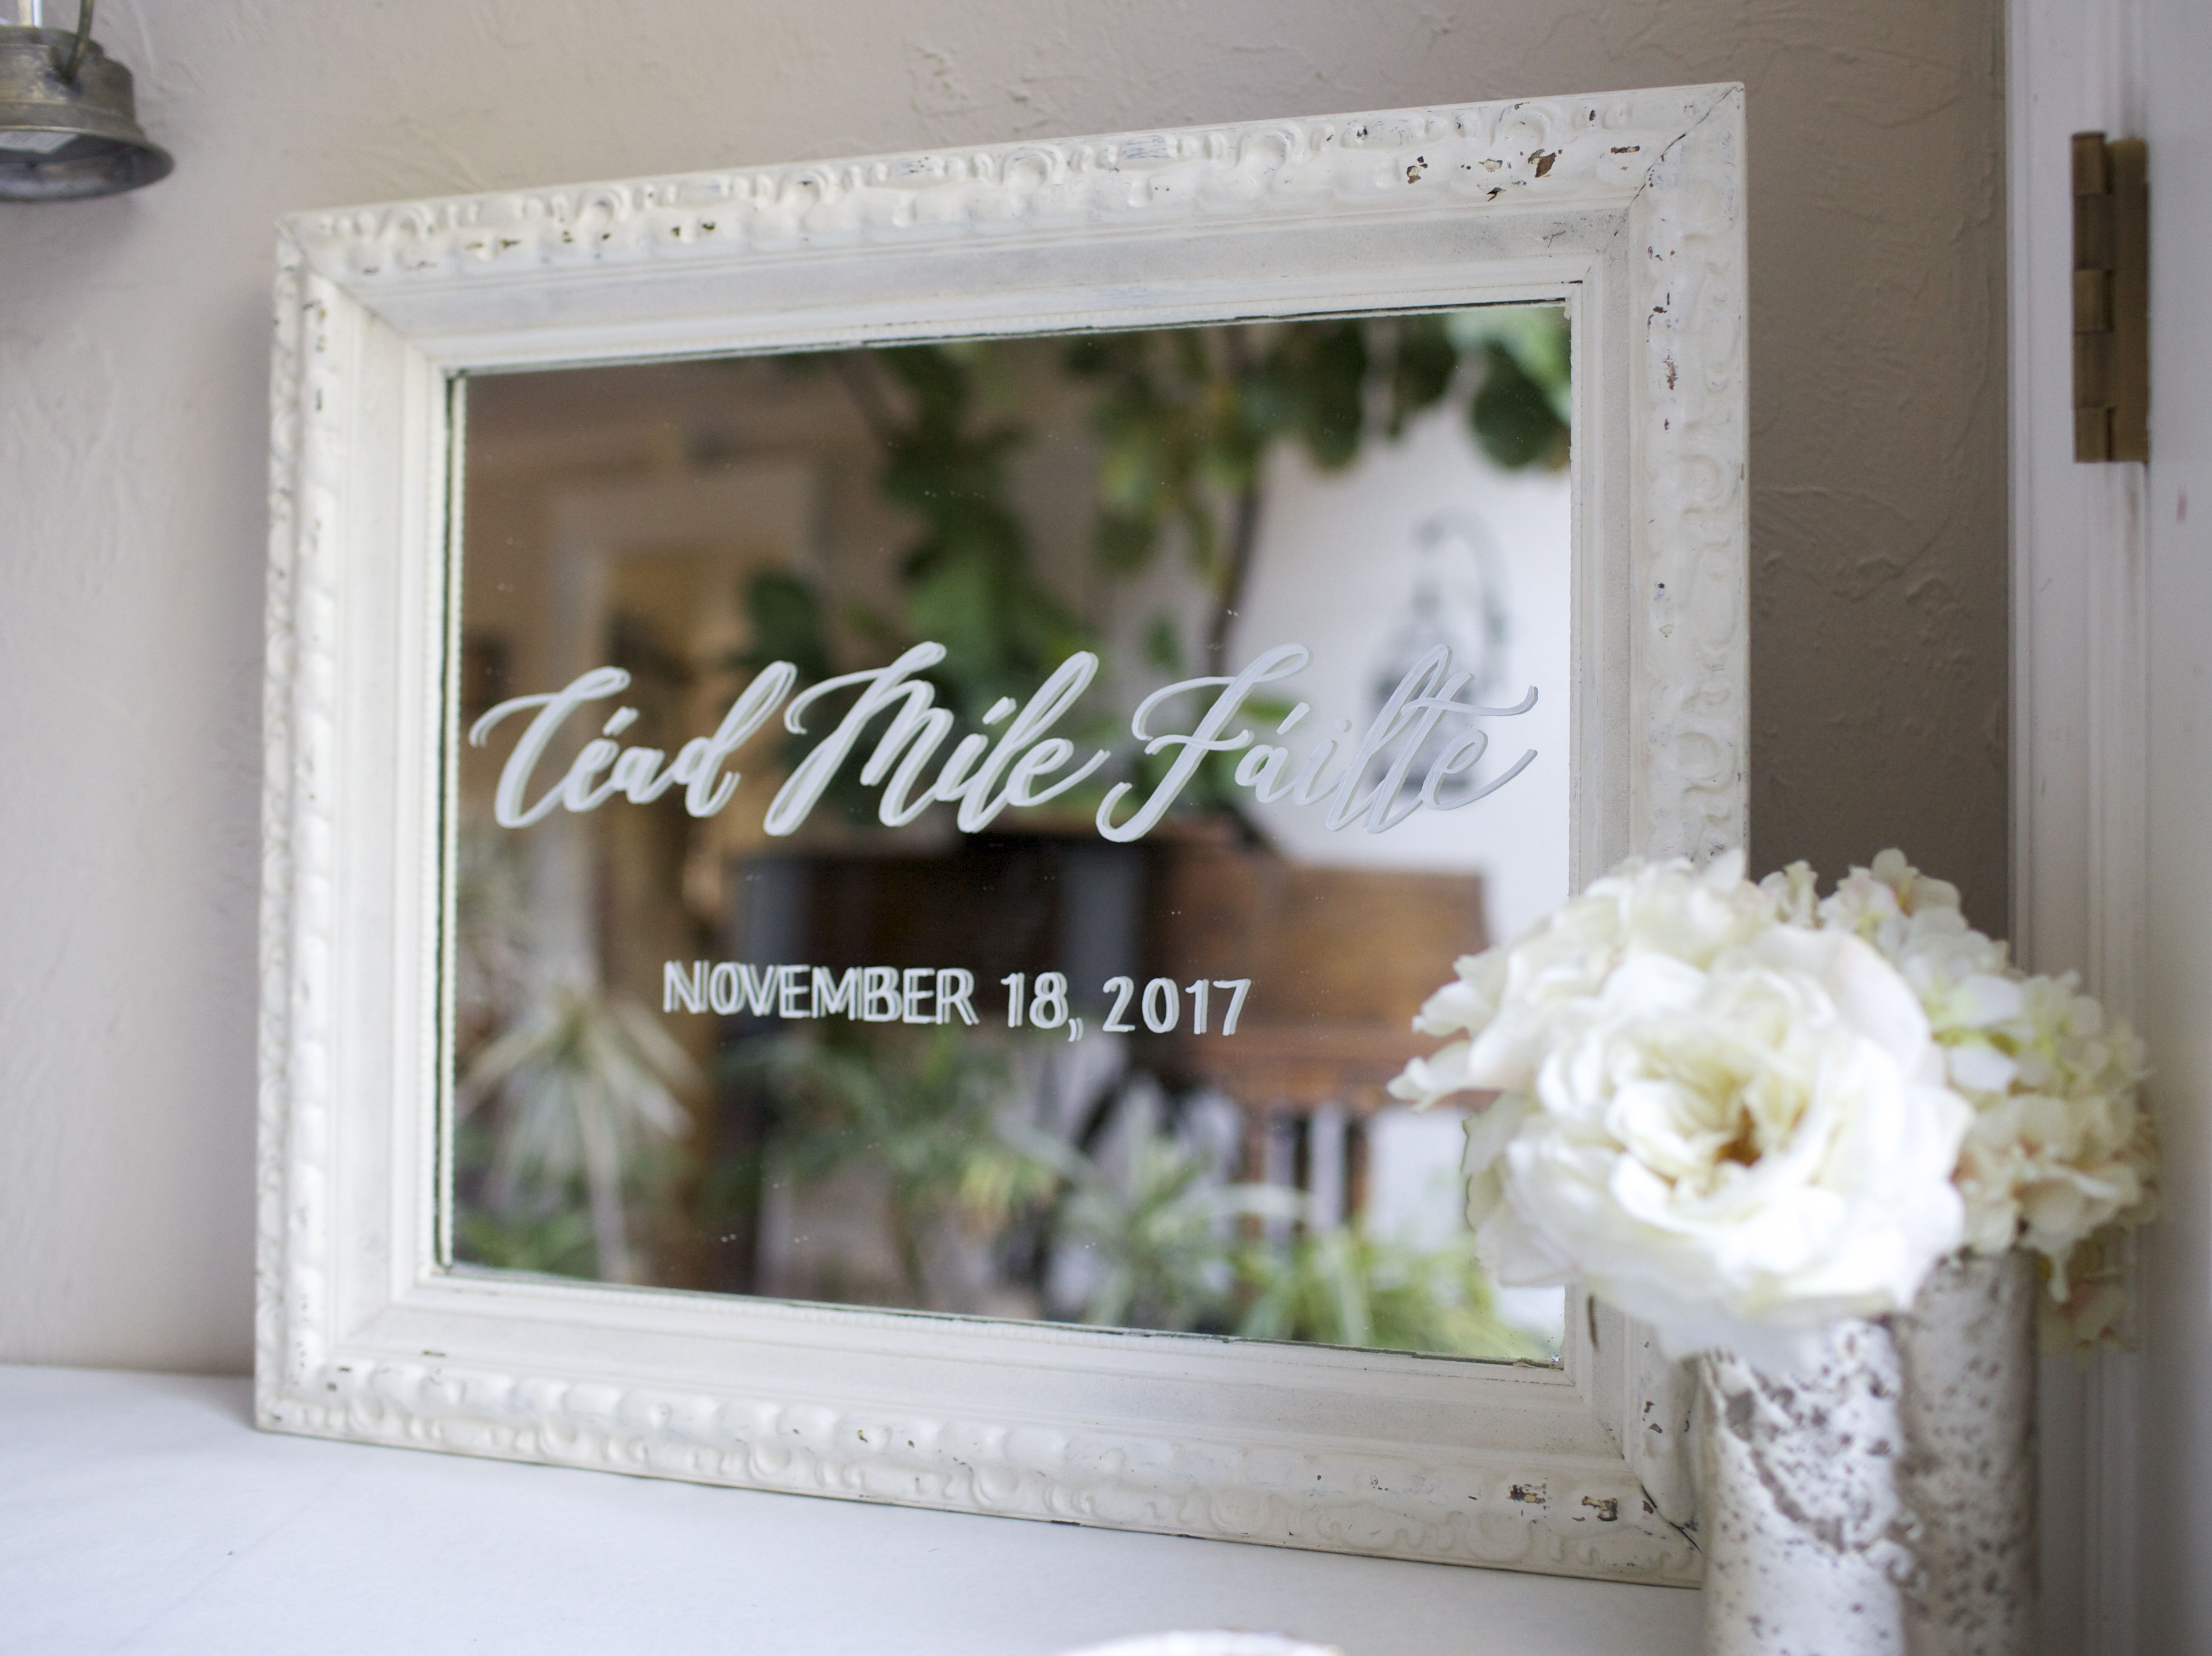 Irish wedding sign, hand painted on vintage shabby